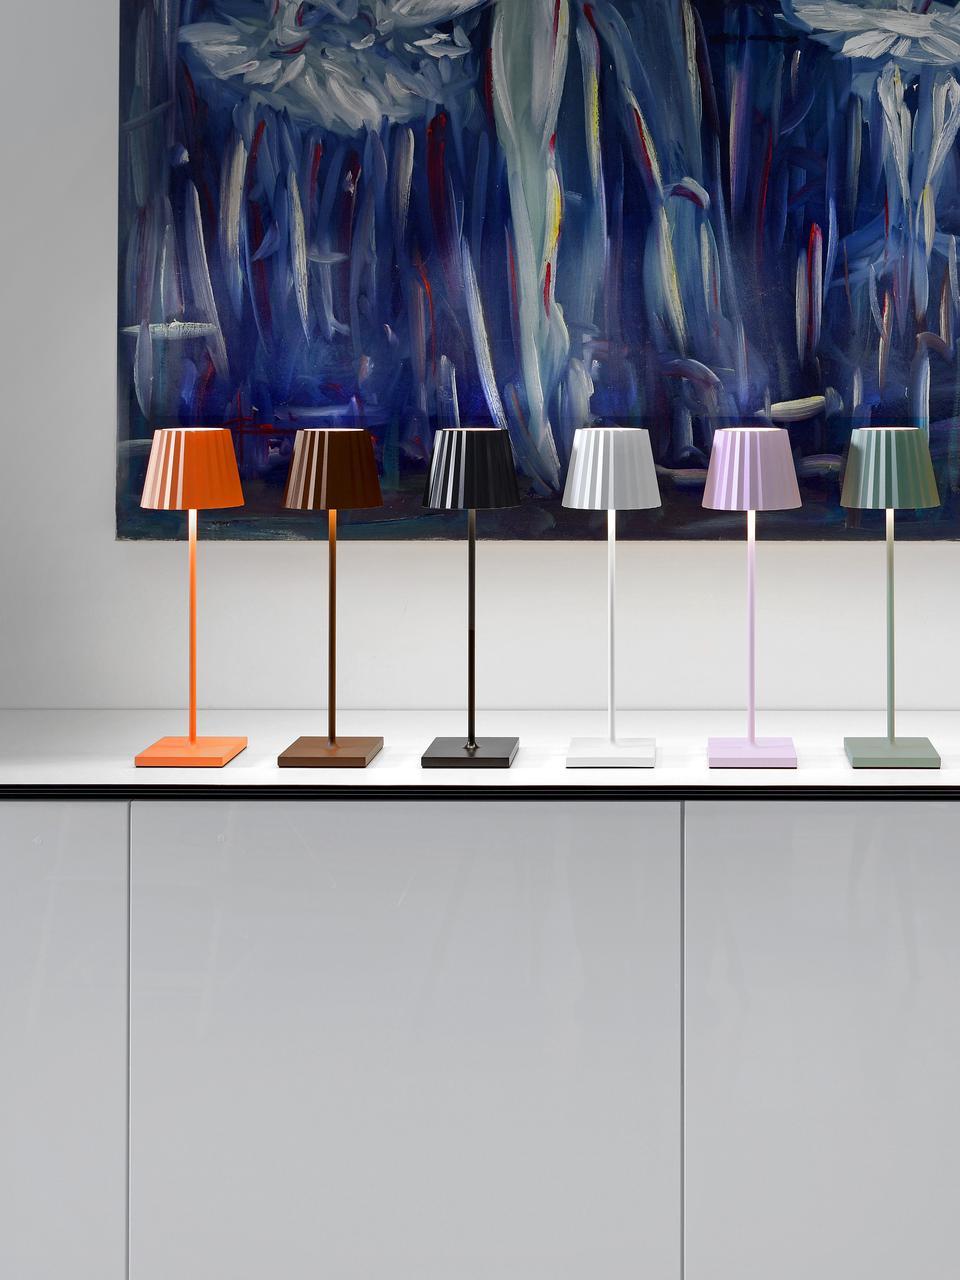 Mobile LED-Außentischleuchte Trellia, Aluminium, lackiert, Schwarz, Ø 15 x H 38 cm